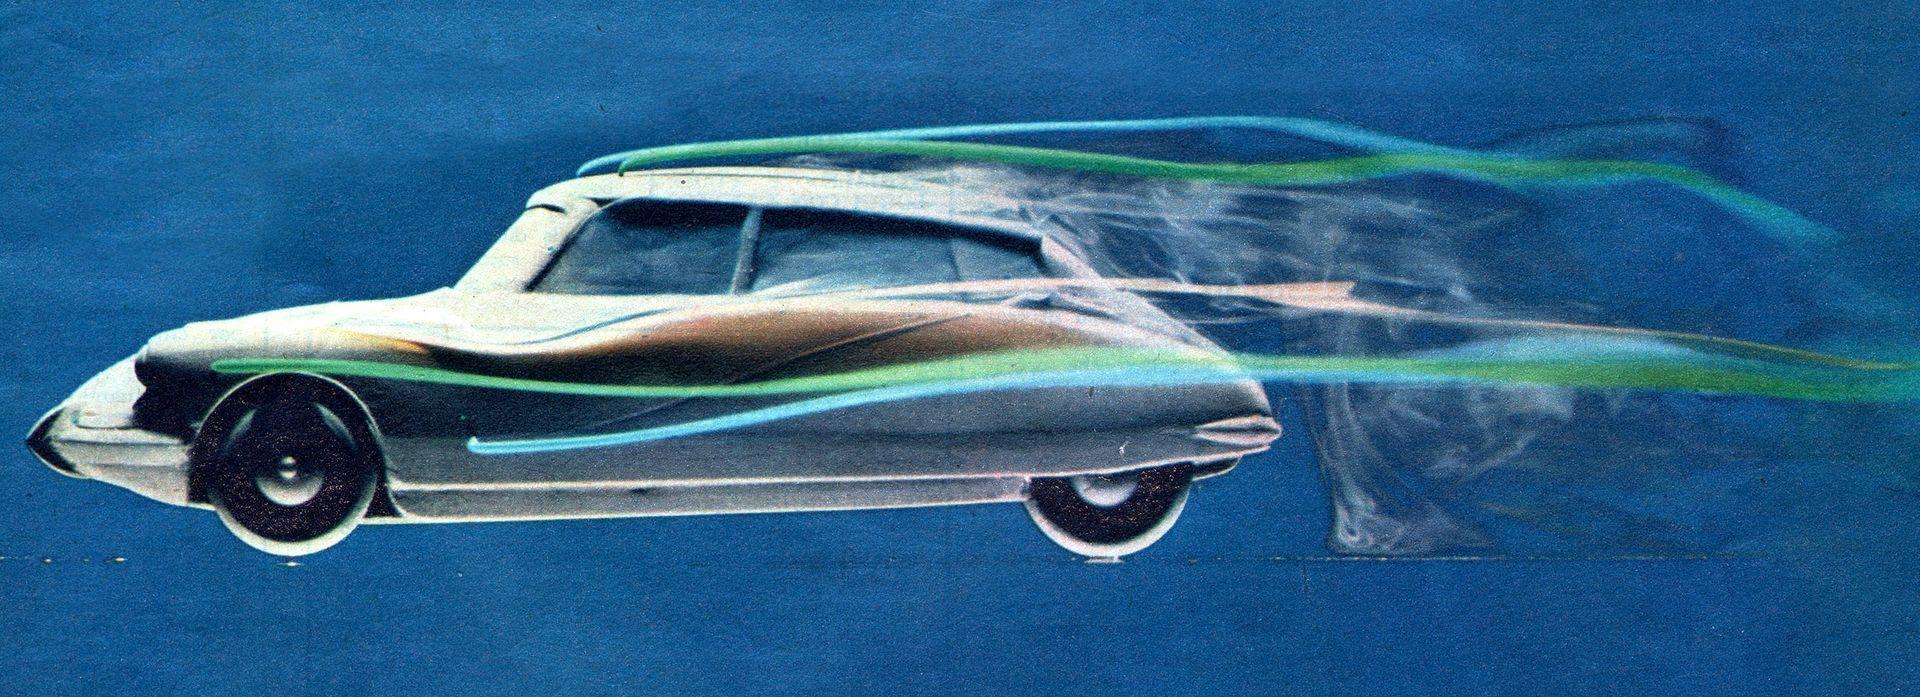 Citroën DS tunel viento